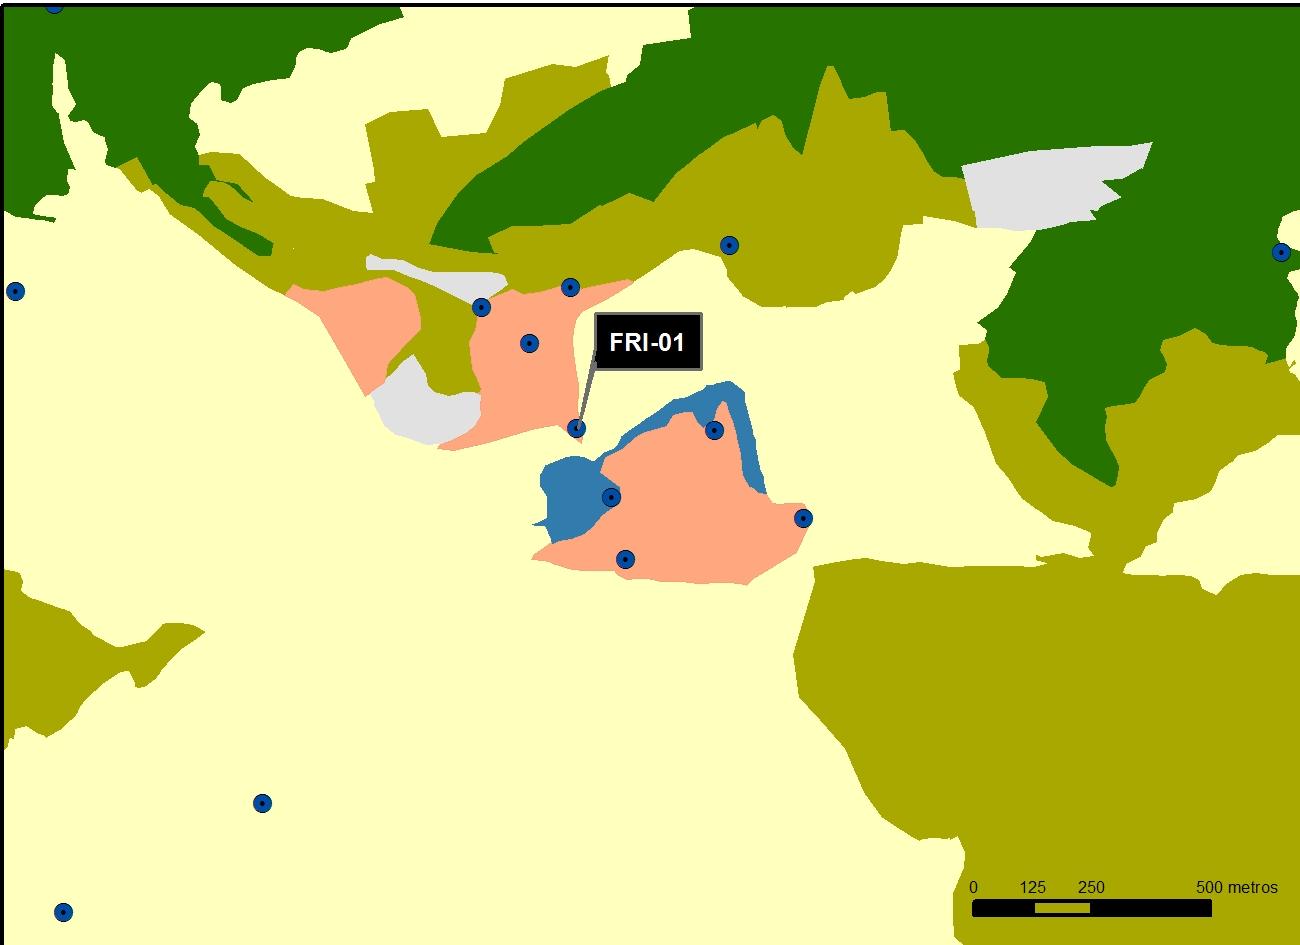 FRI_01_M.V.LOZANO_VIRGEN_MAP.VEG